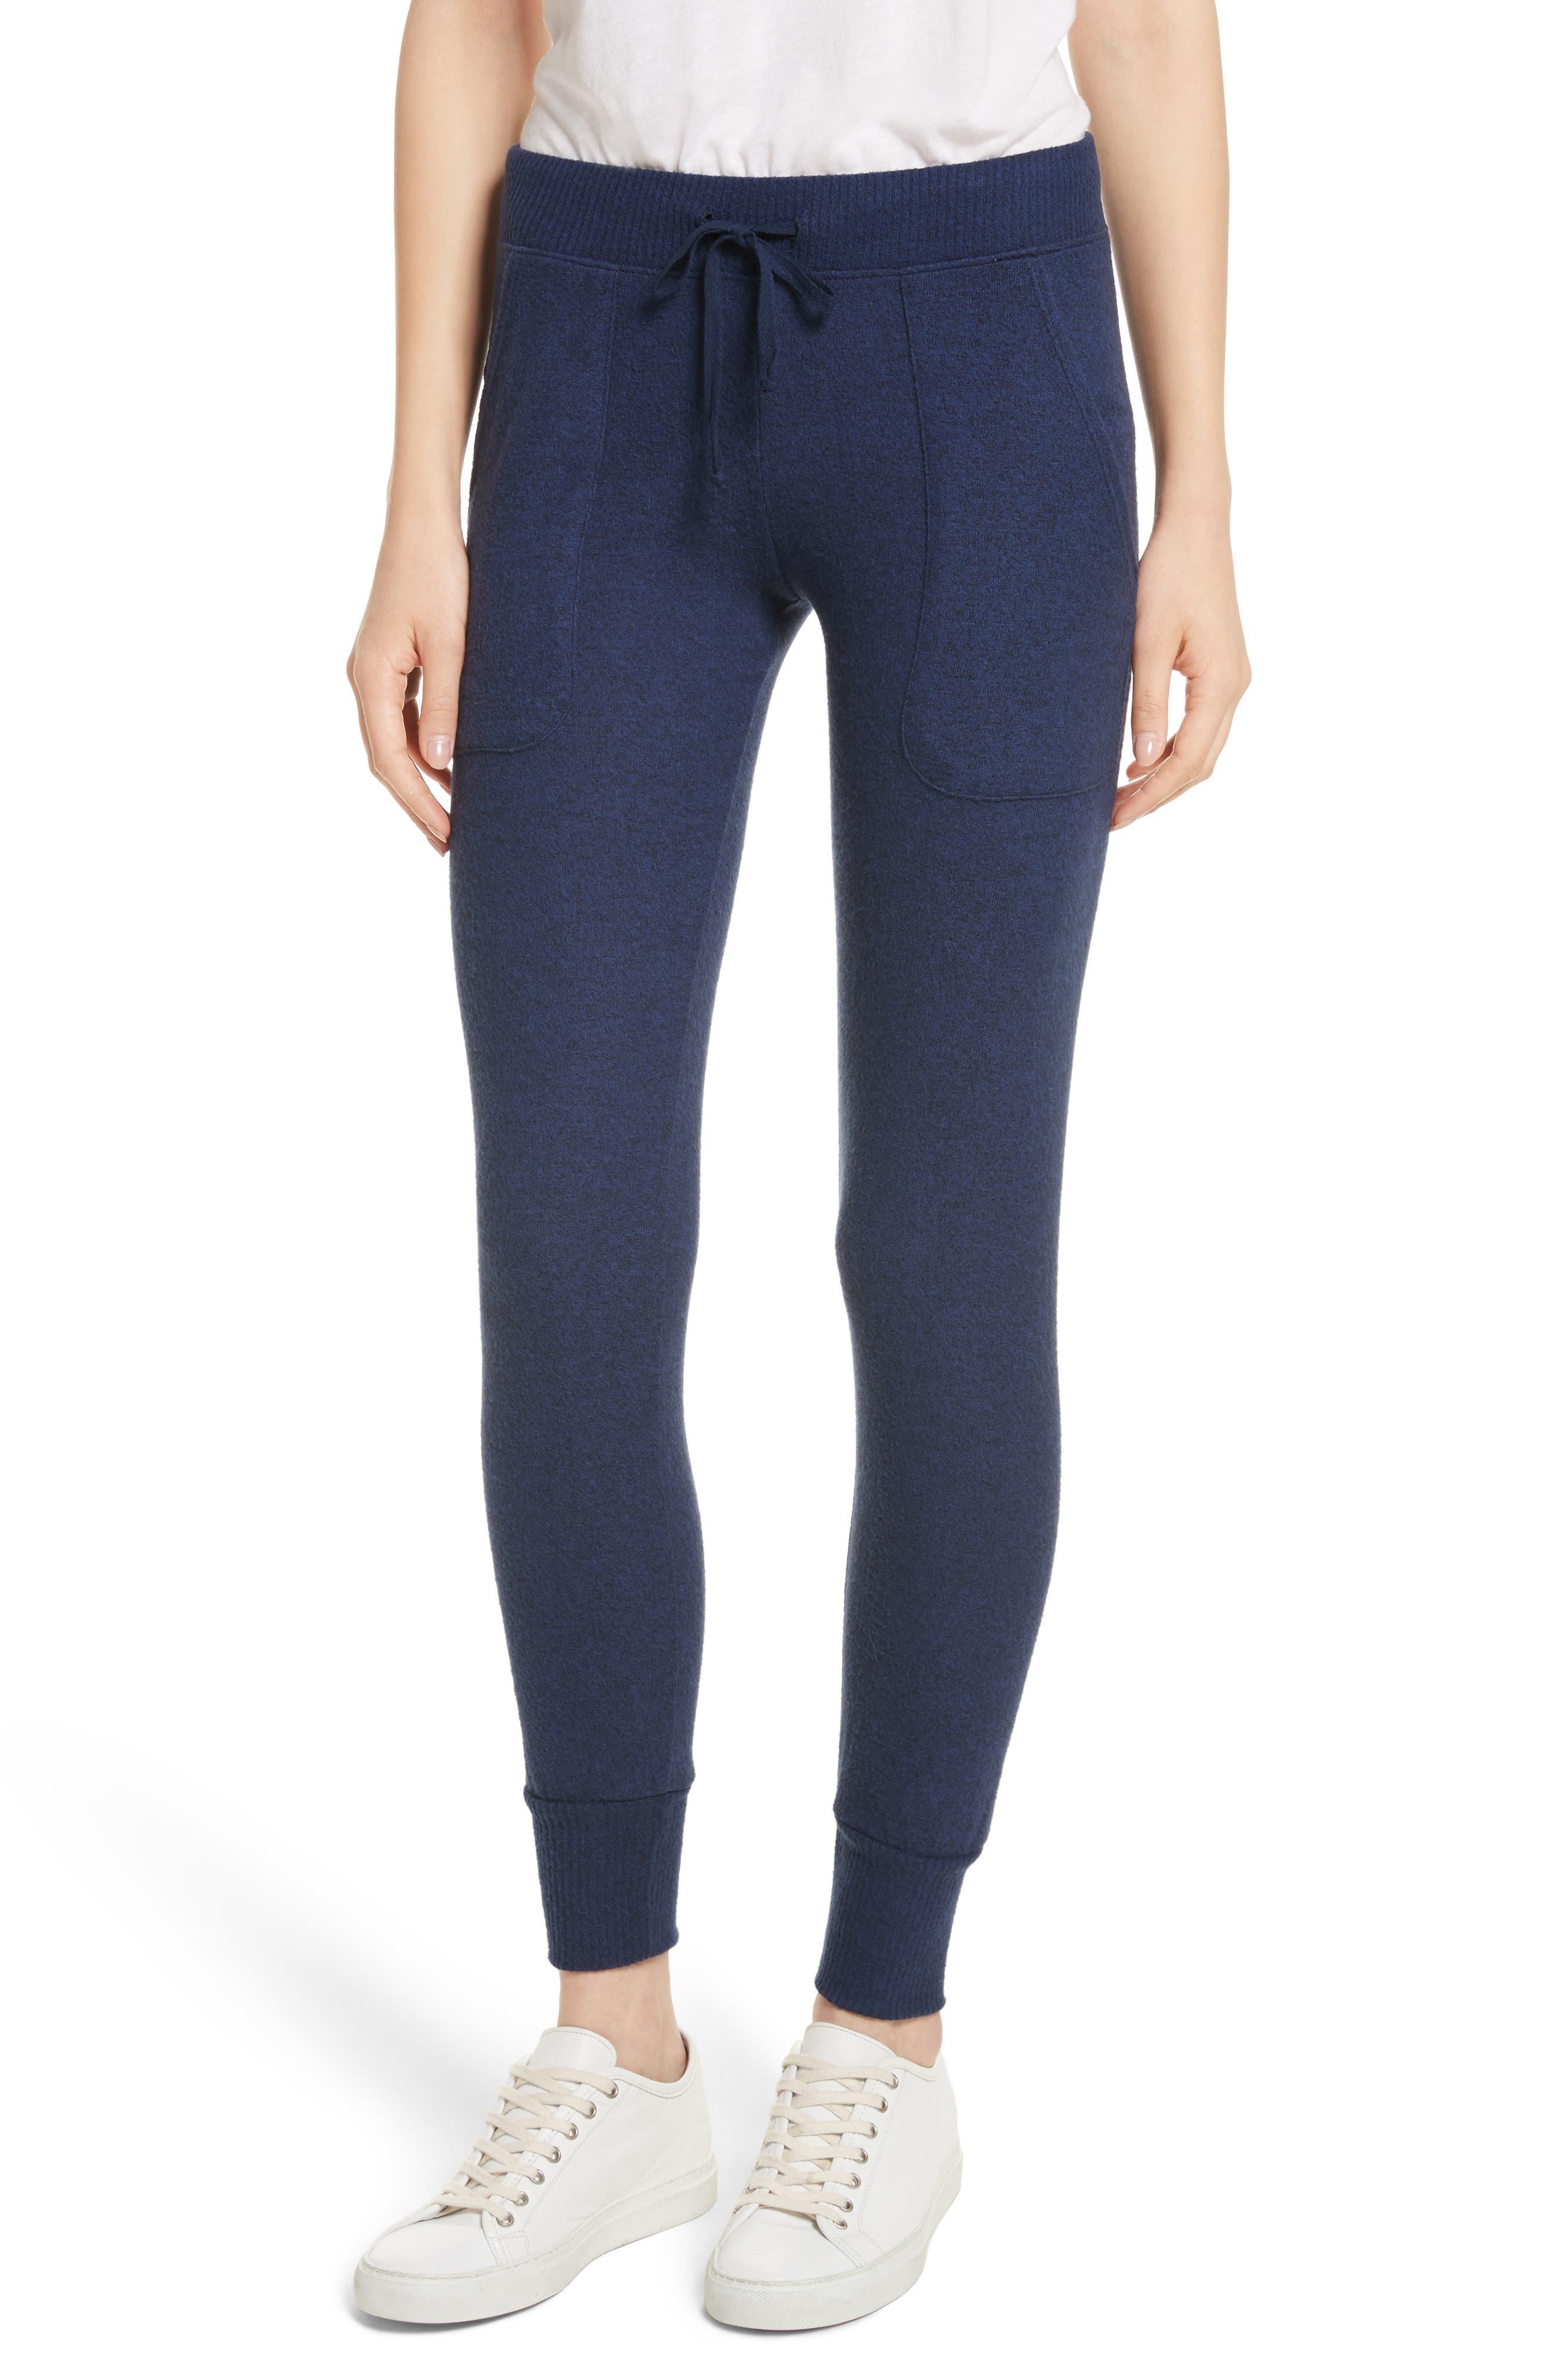 Tendra Jogger Pants,                         Main,                         color,